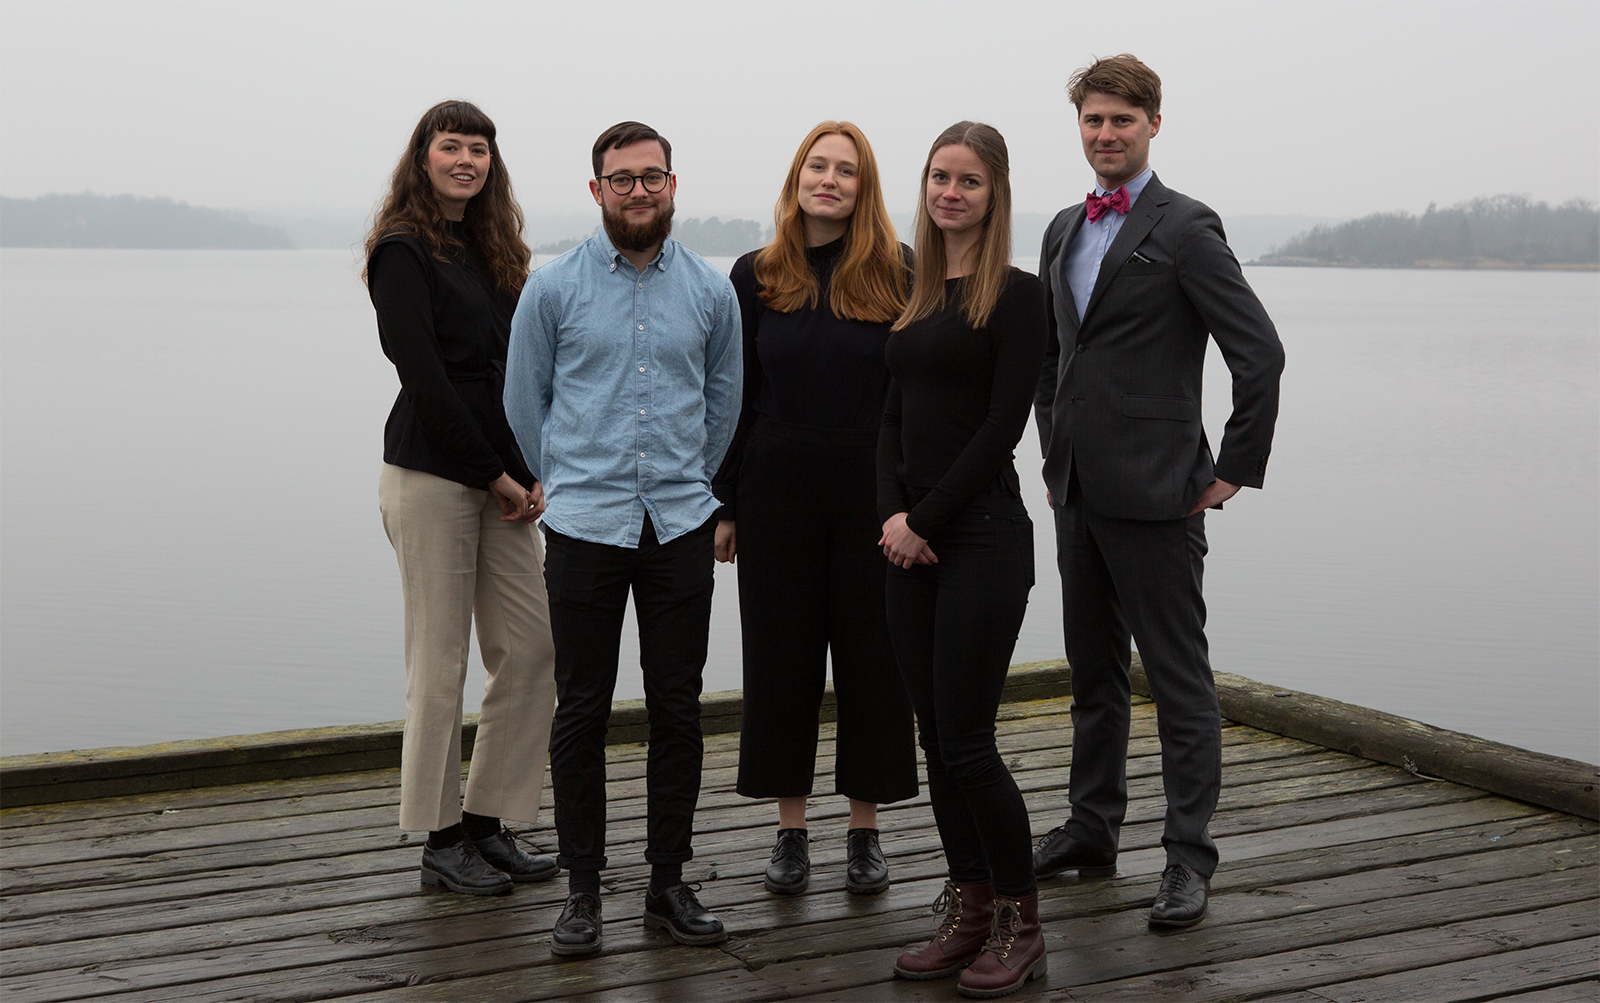 Arkipelago Karlskronas styrelse 2018–2019. Linnea Sundström, John Ljungberg, Nellie Stenvall, Manda Bensköld och August Ekman Öhrn.